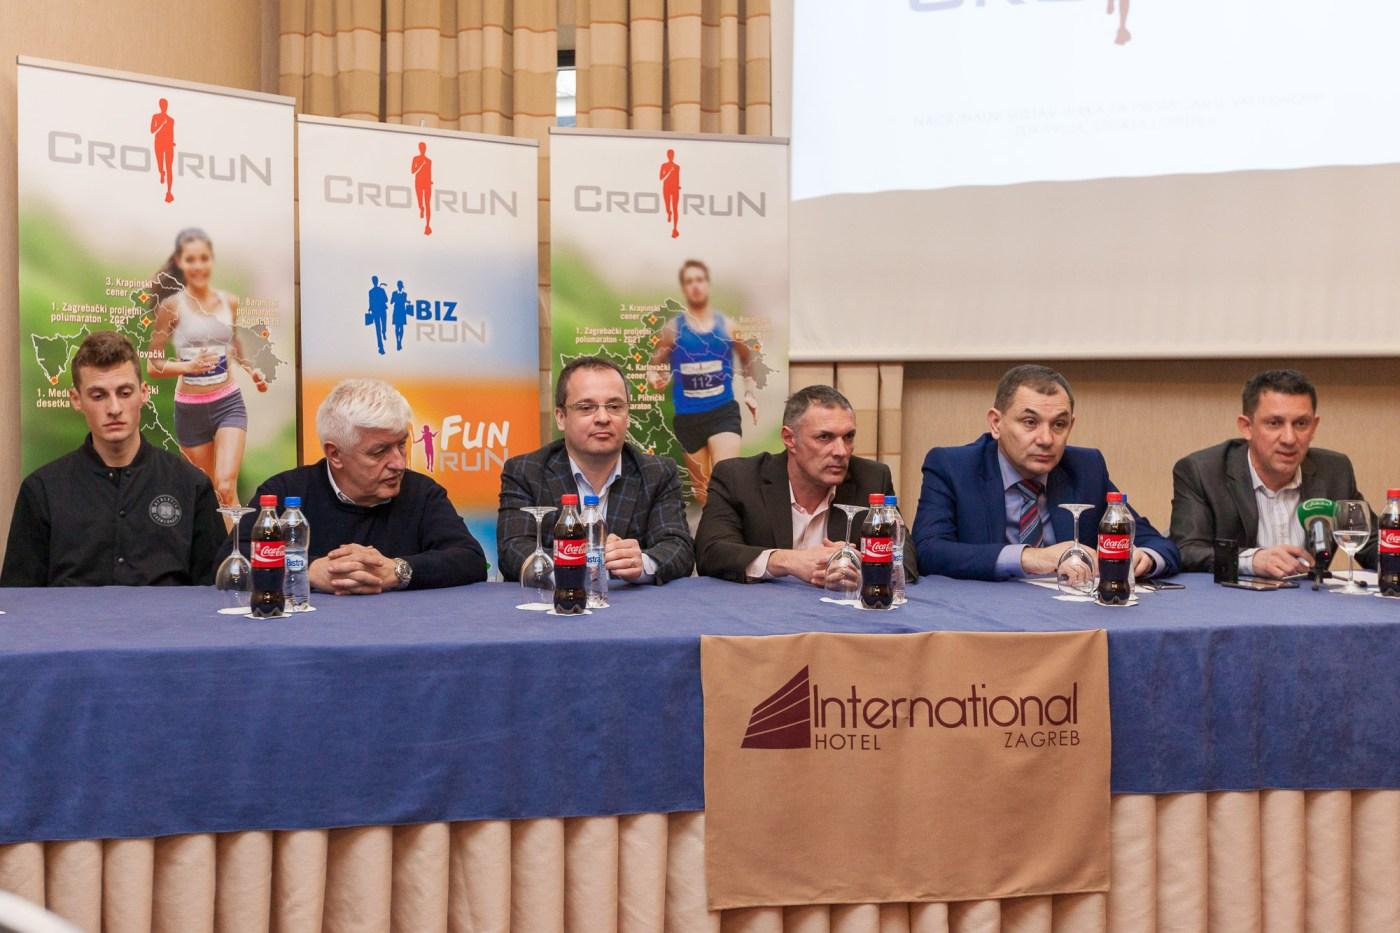 Dino Bošnjak, dr. Zvonimir Šostar, Dalibor Bilić, Siniša Ergotić, Ivica Lovrić, Robert Franjković